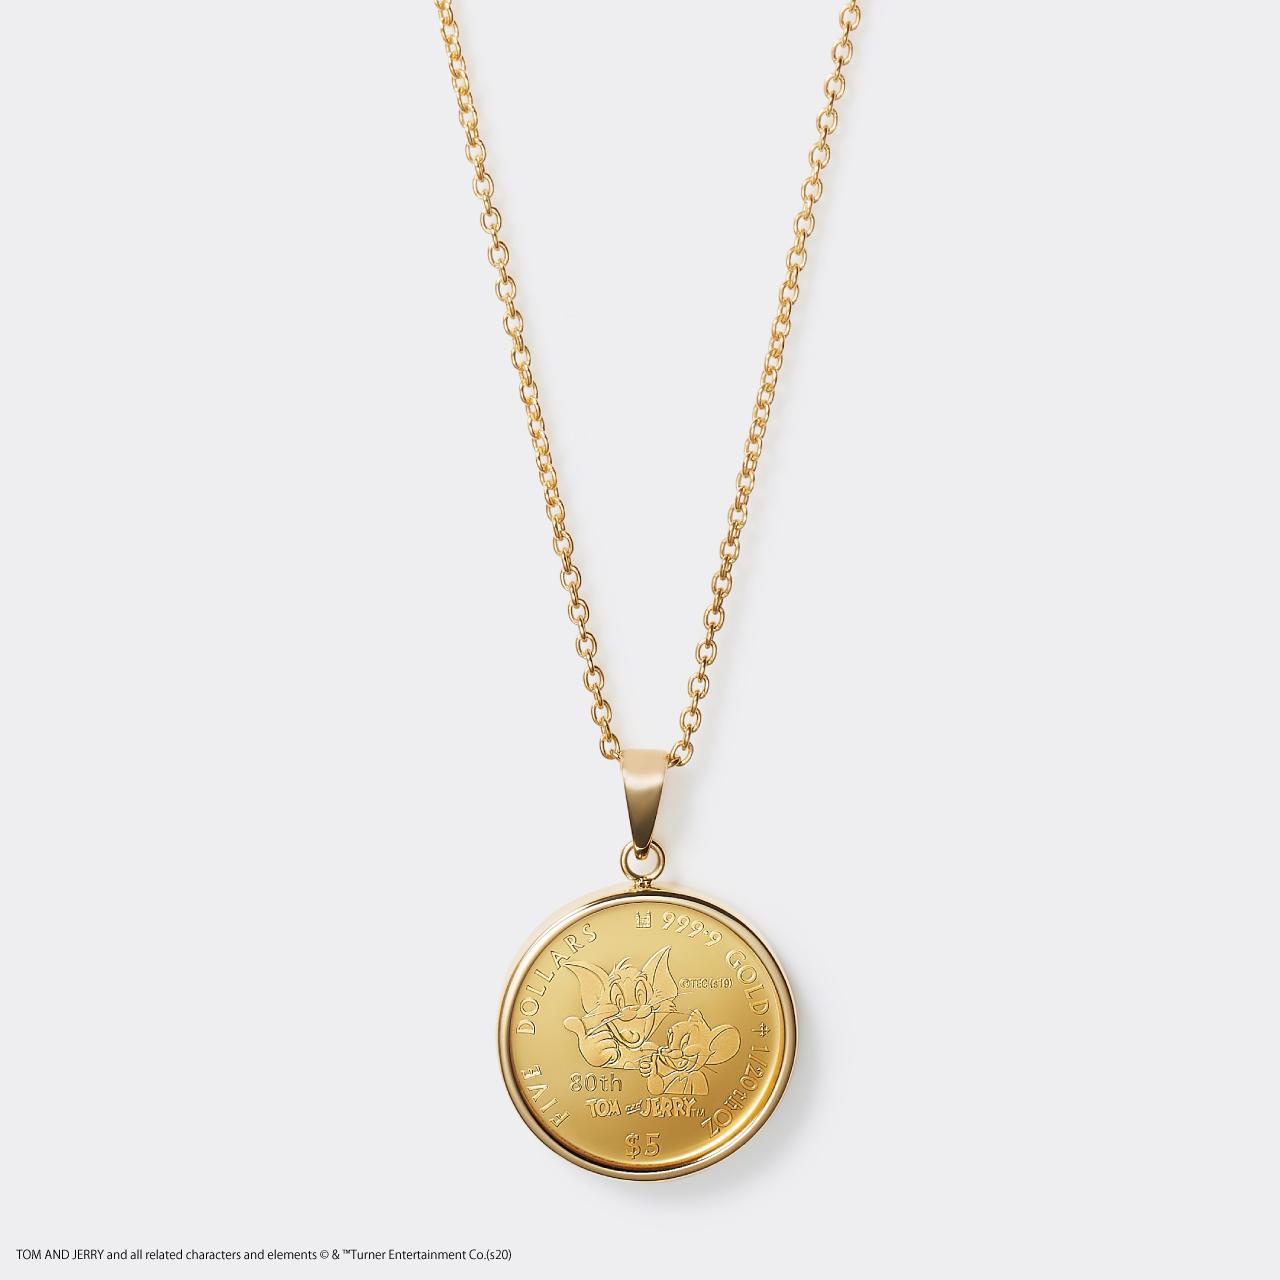 2020 TOM&JERRY 1/20 GOLD PROOF COIN NECKLACE(トムとジェリー 80周年記念硬貨ネックレス 1/20オンス)